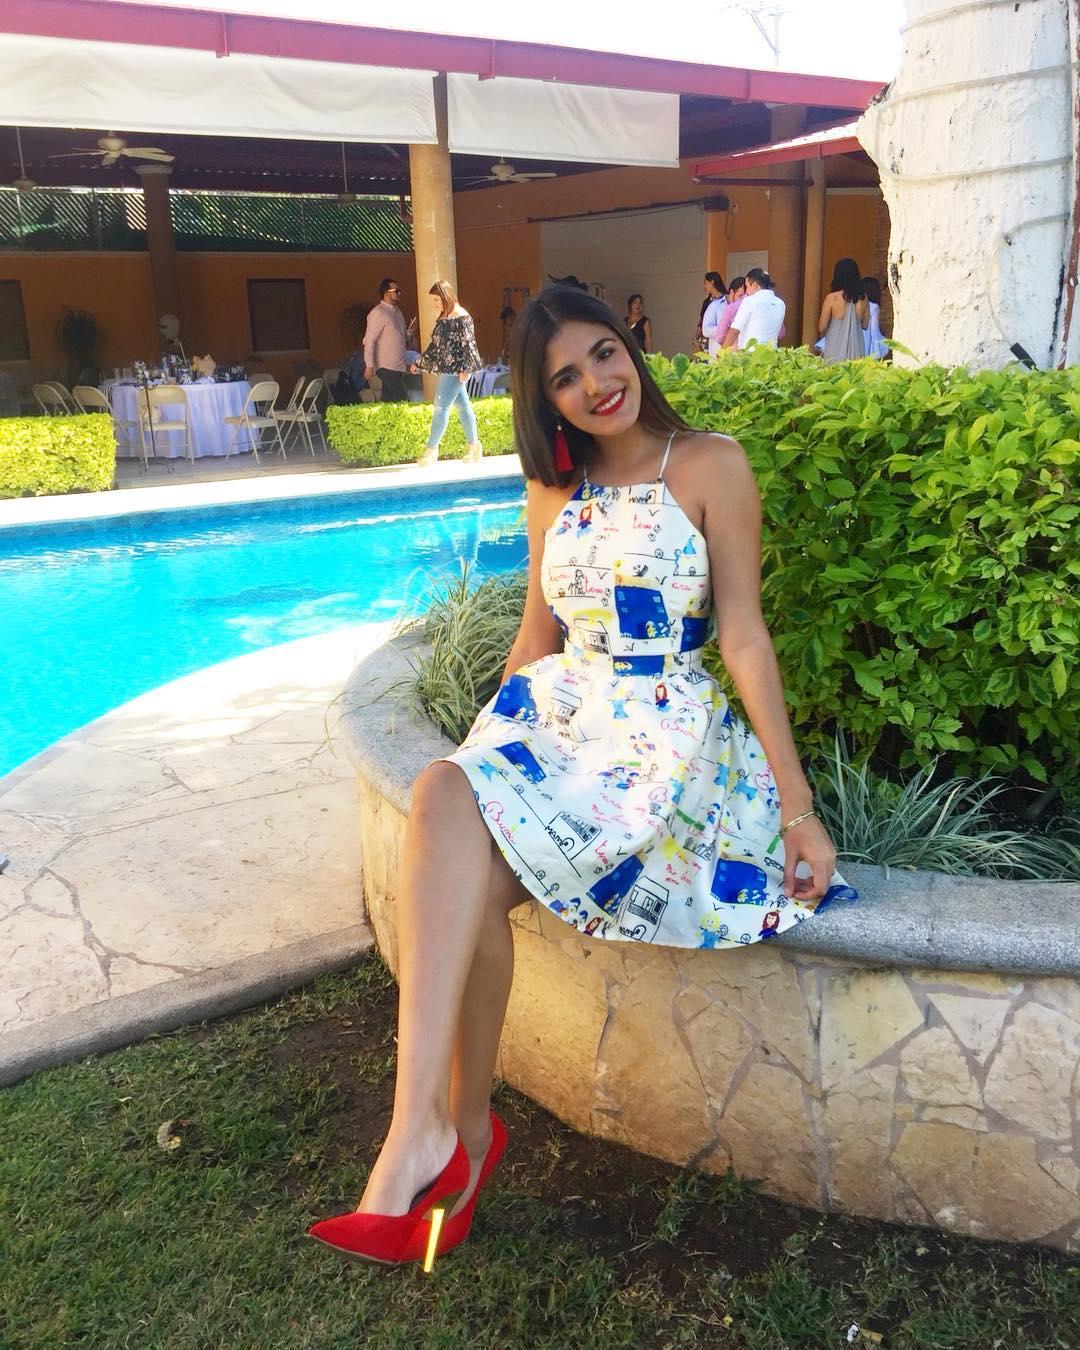 phegda bustillos, miss mexico para reinado inernacional cafe 2018. Vd5tp2h7